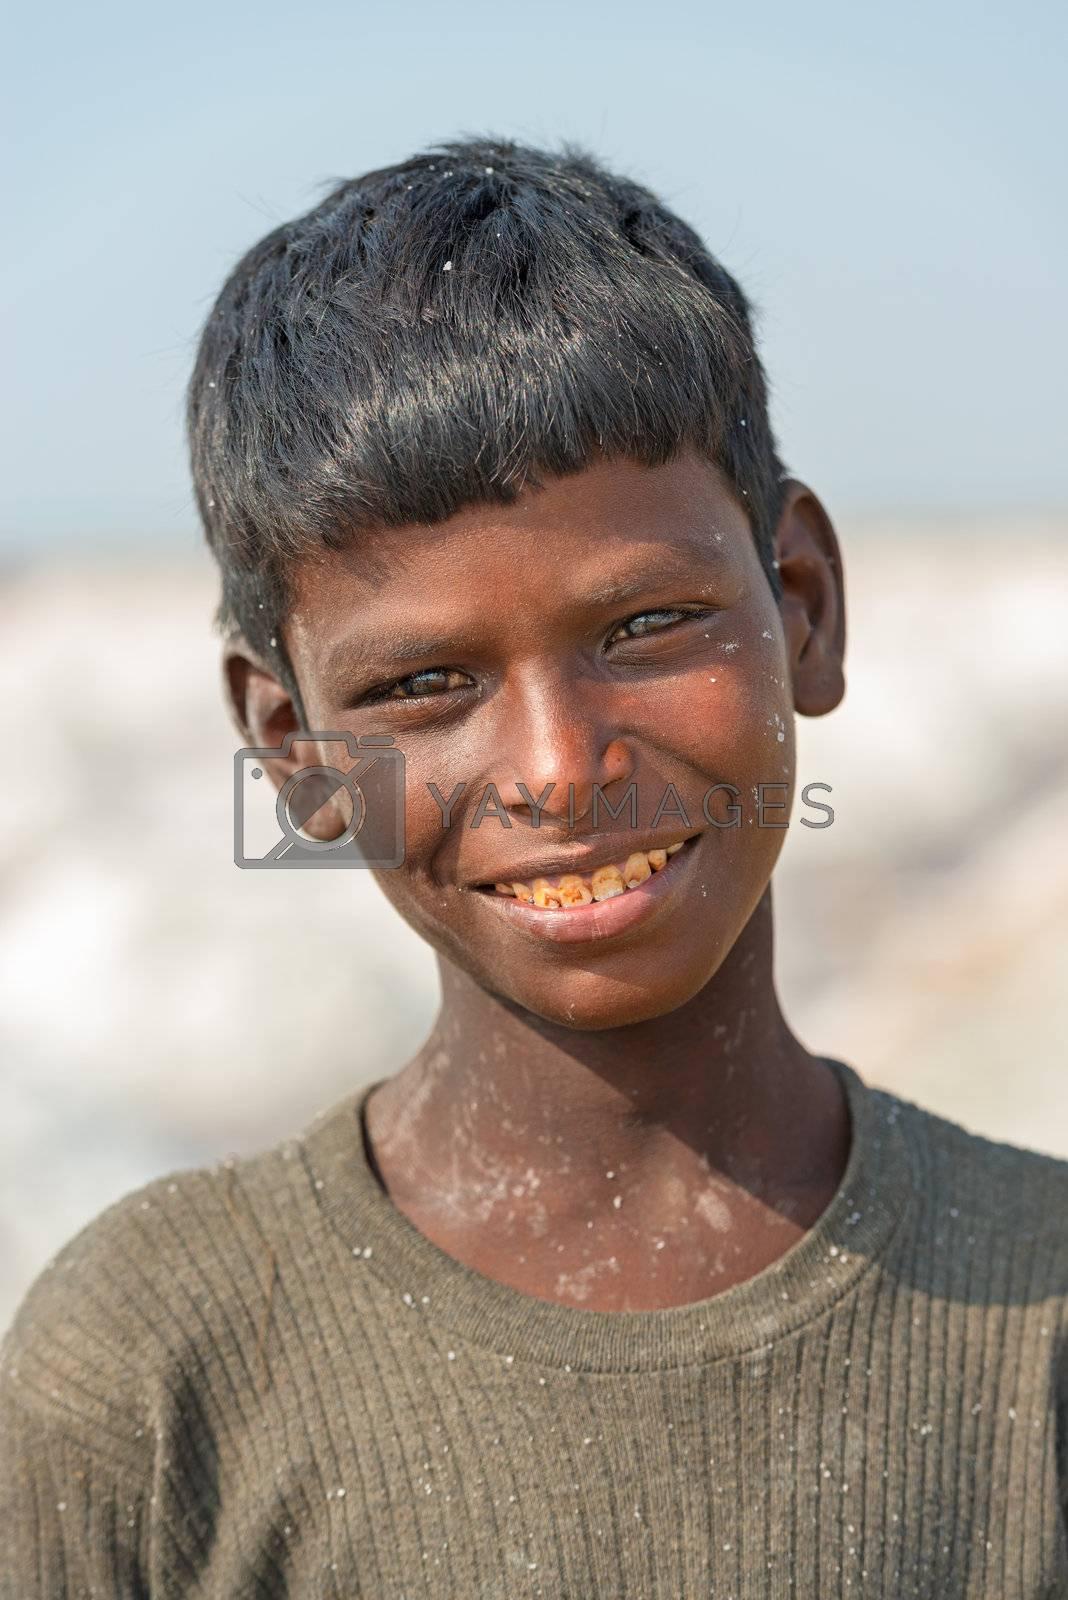 Sambhar, India - Nov 19: Portrait of indian kid in salt farm on Nov 19, 2012 in Sambhar Salt Lake, India. It is India's largest saline lake and where salt has been farmed for a thousand years.